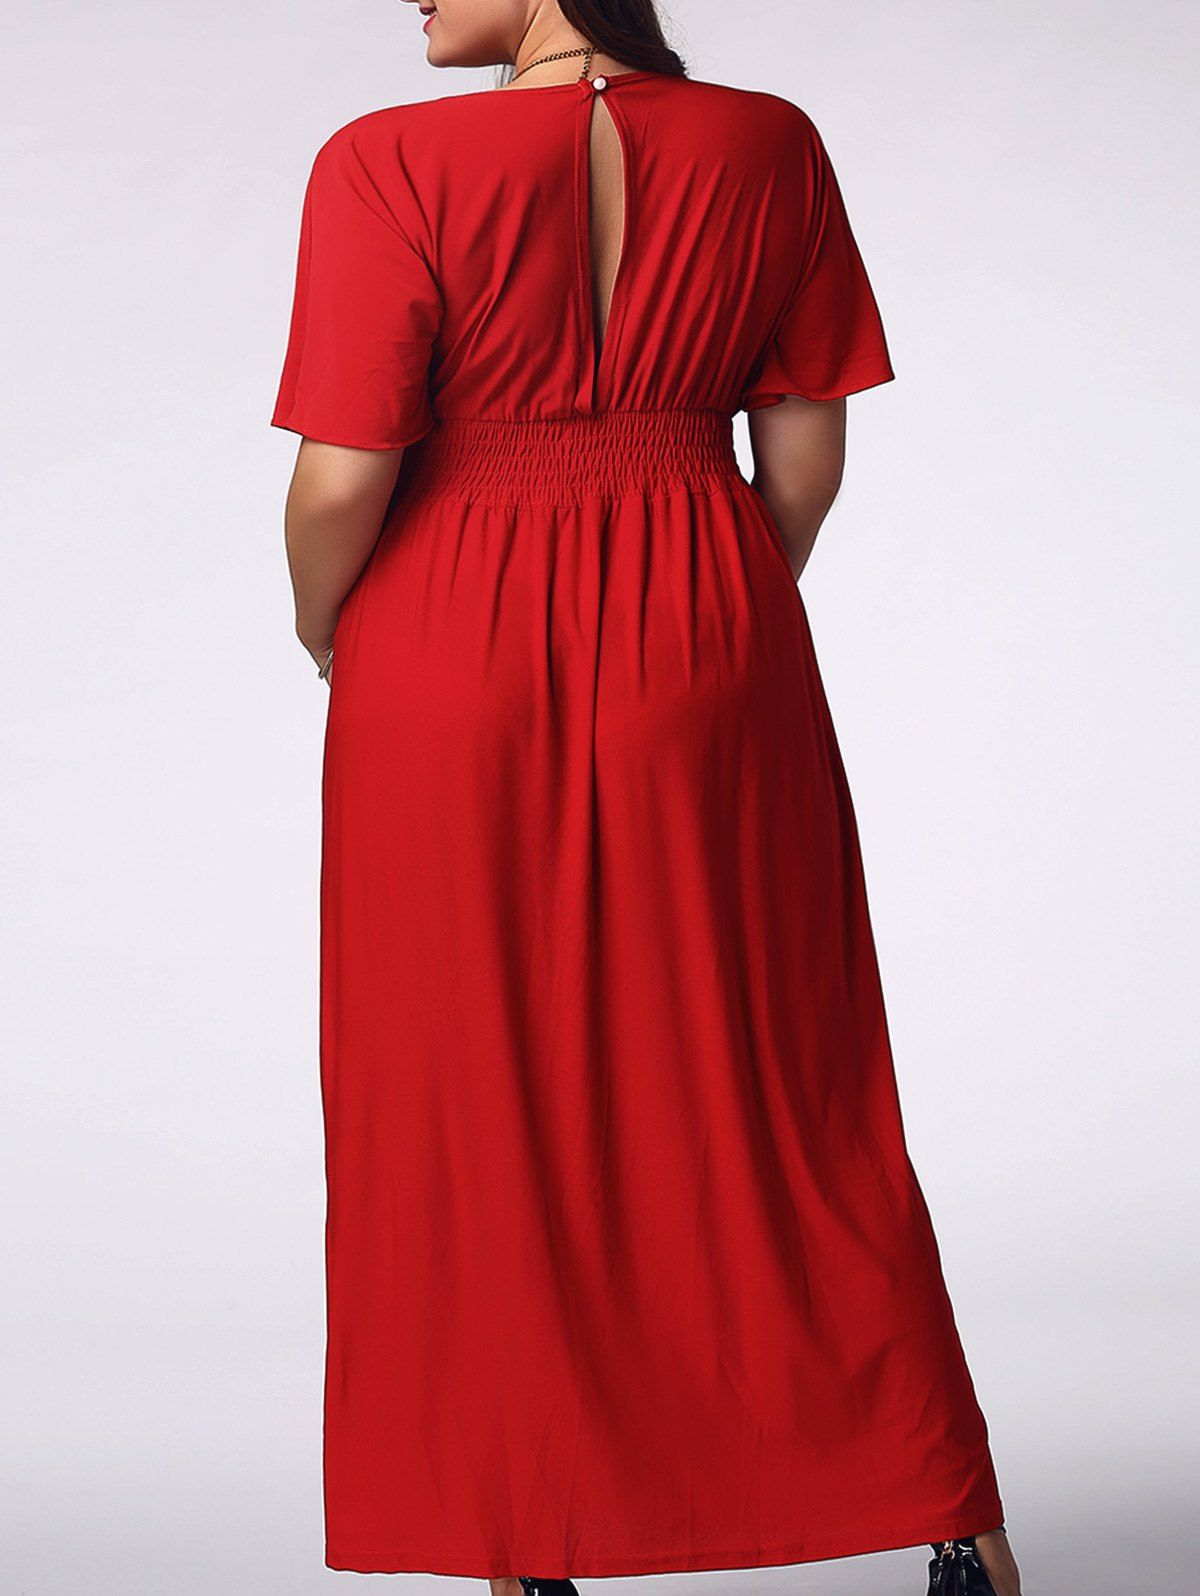 Elegant plus size plunging neck short sleeve solid color womenus